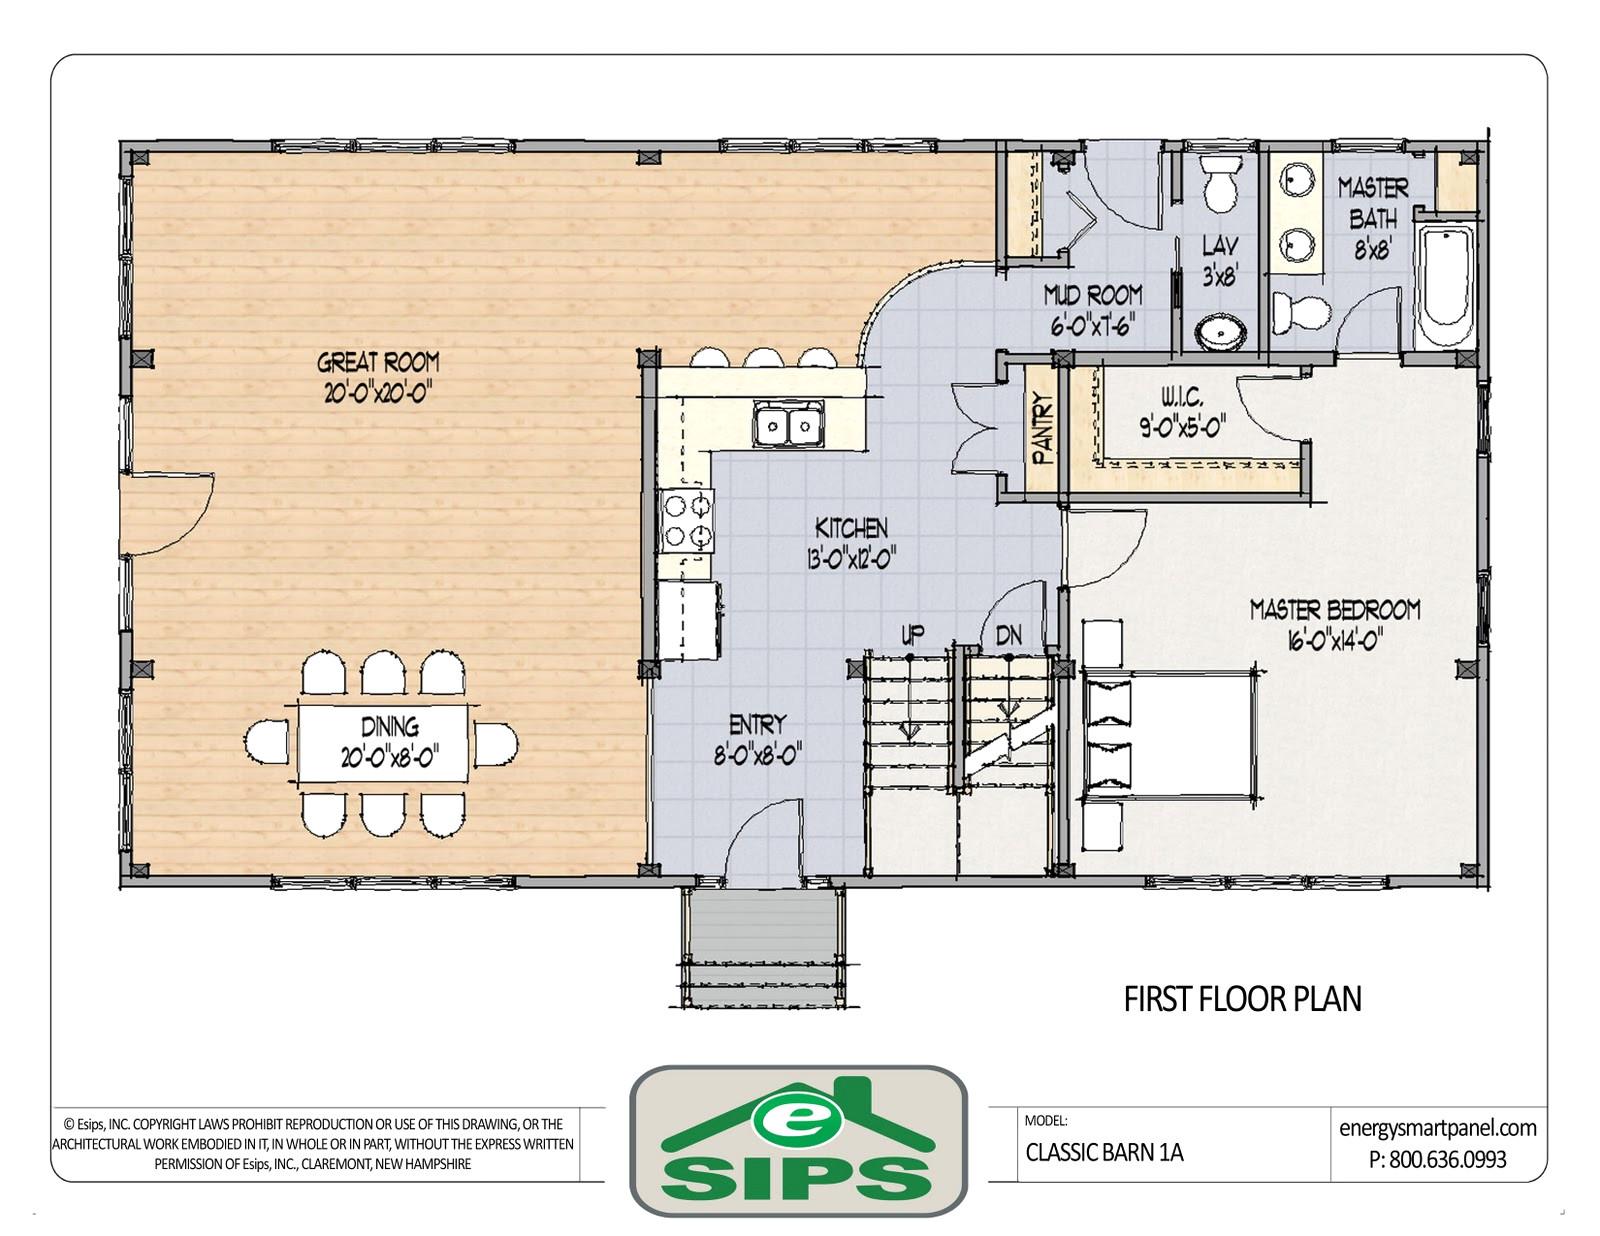 starlight homes floor plans unique historical concepts house plans